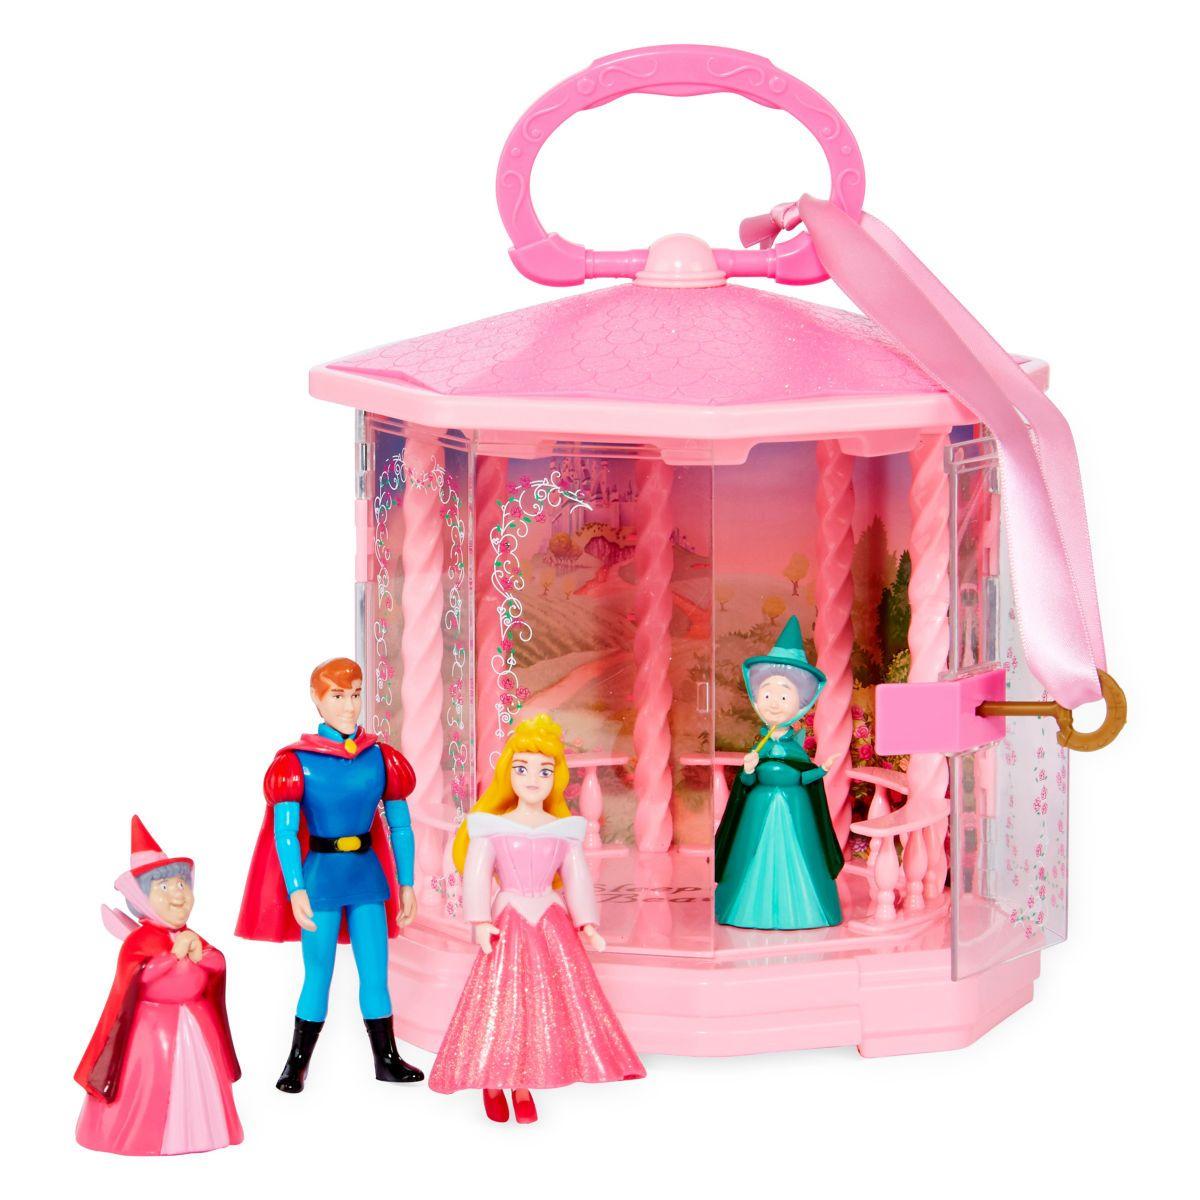 Cindy Barbie Doll Sleeping Bag Disney Princess Bed// accessories